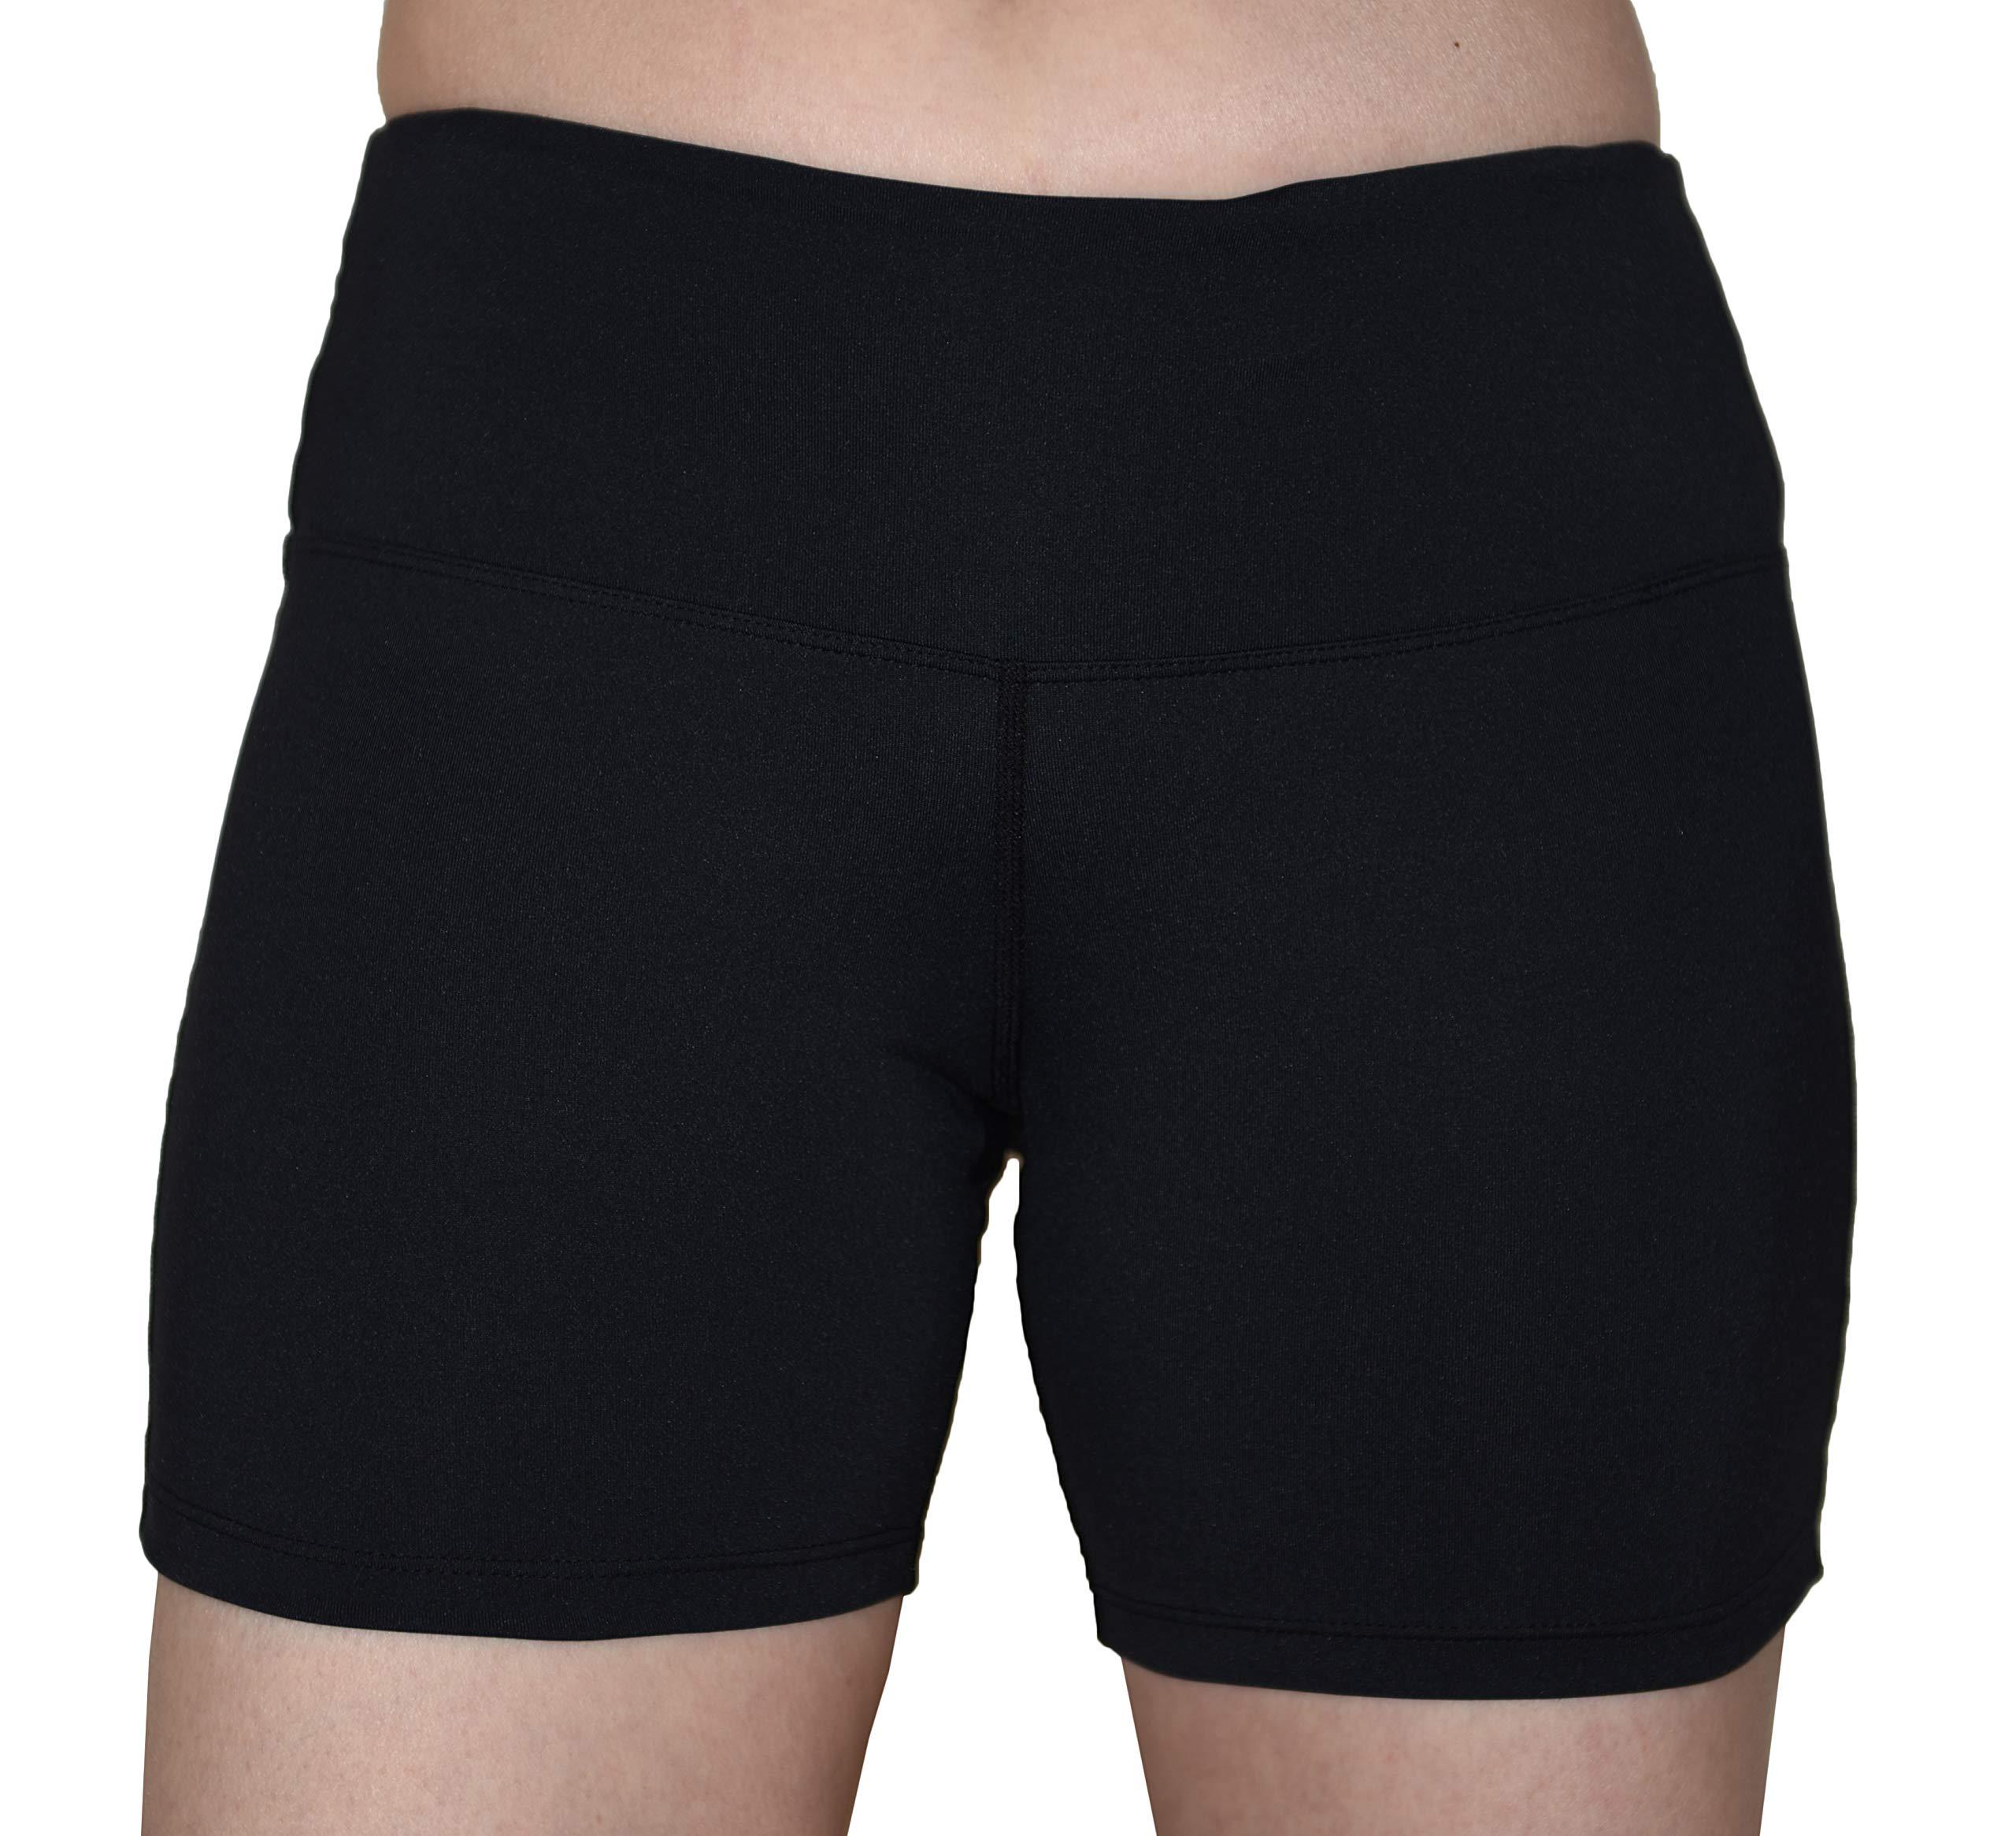 Private Island Women UV Swim Rash Guard Pockets Shorts Pants Yoga (XXL, Black) by Private Island